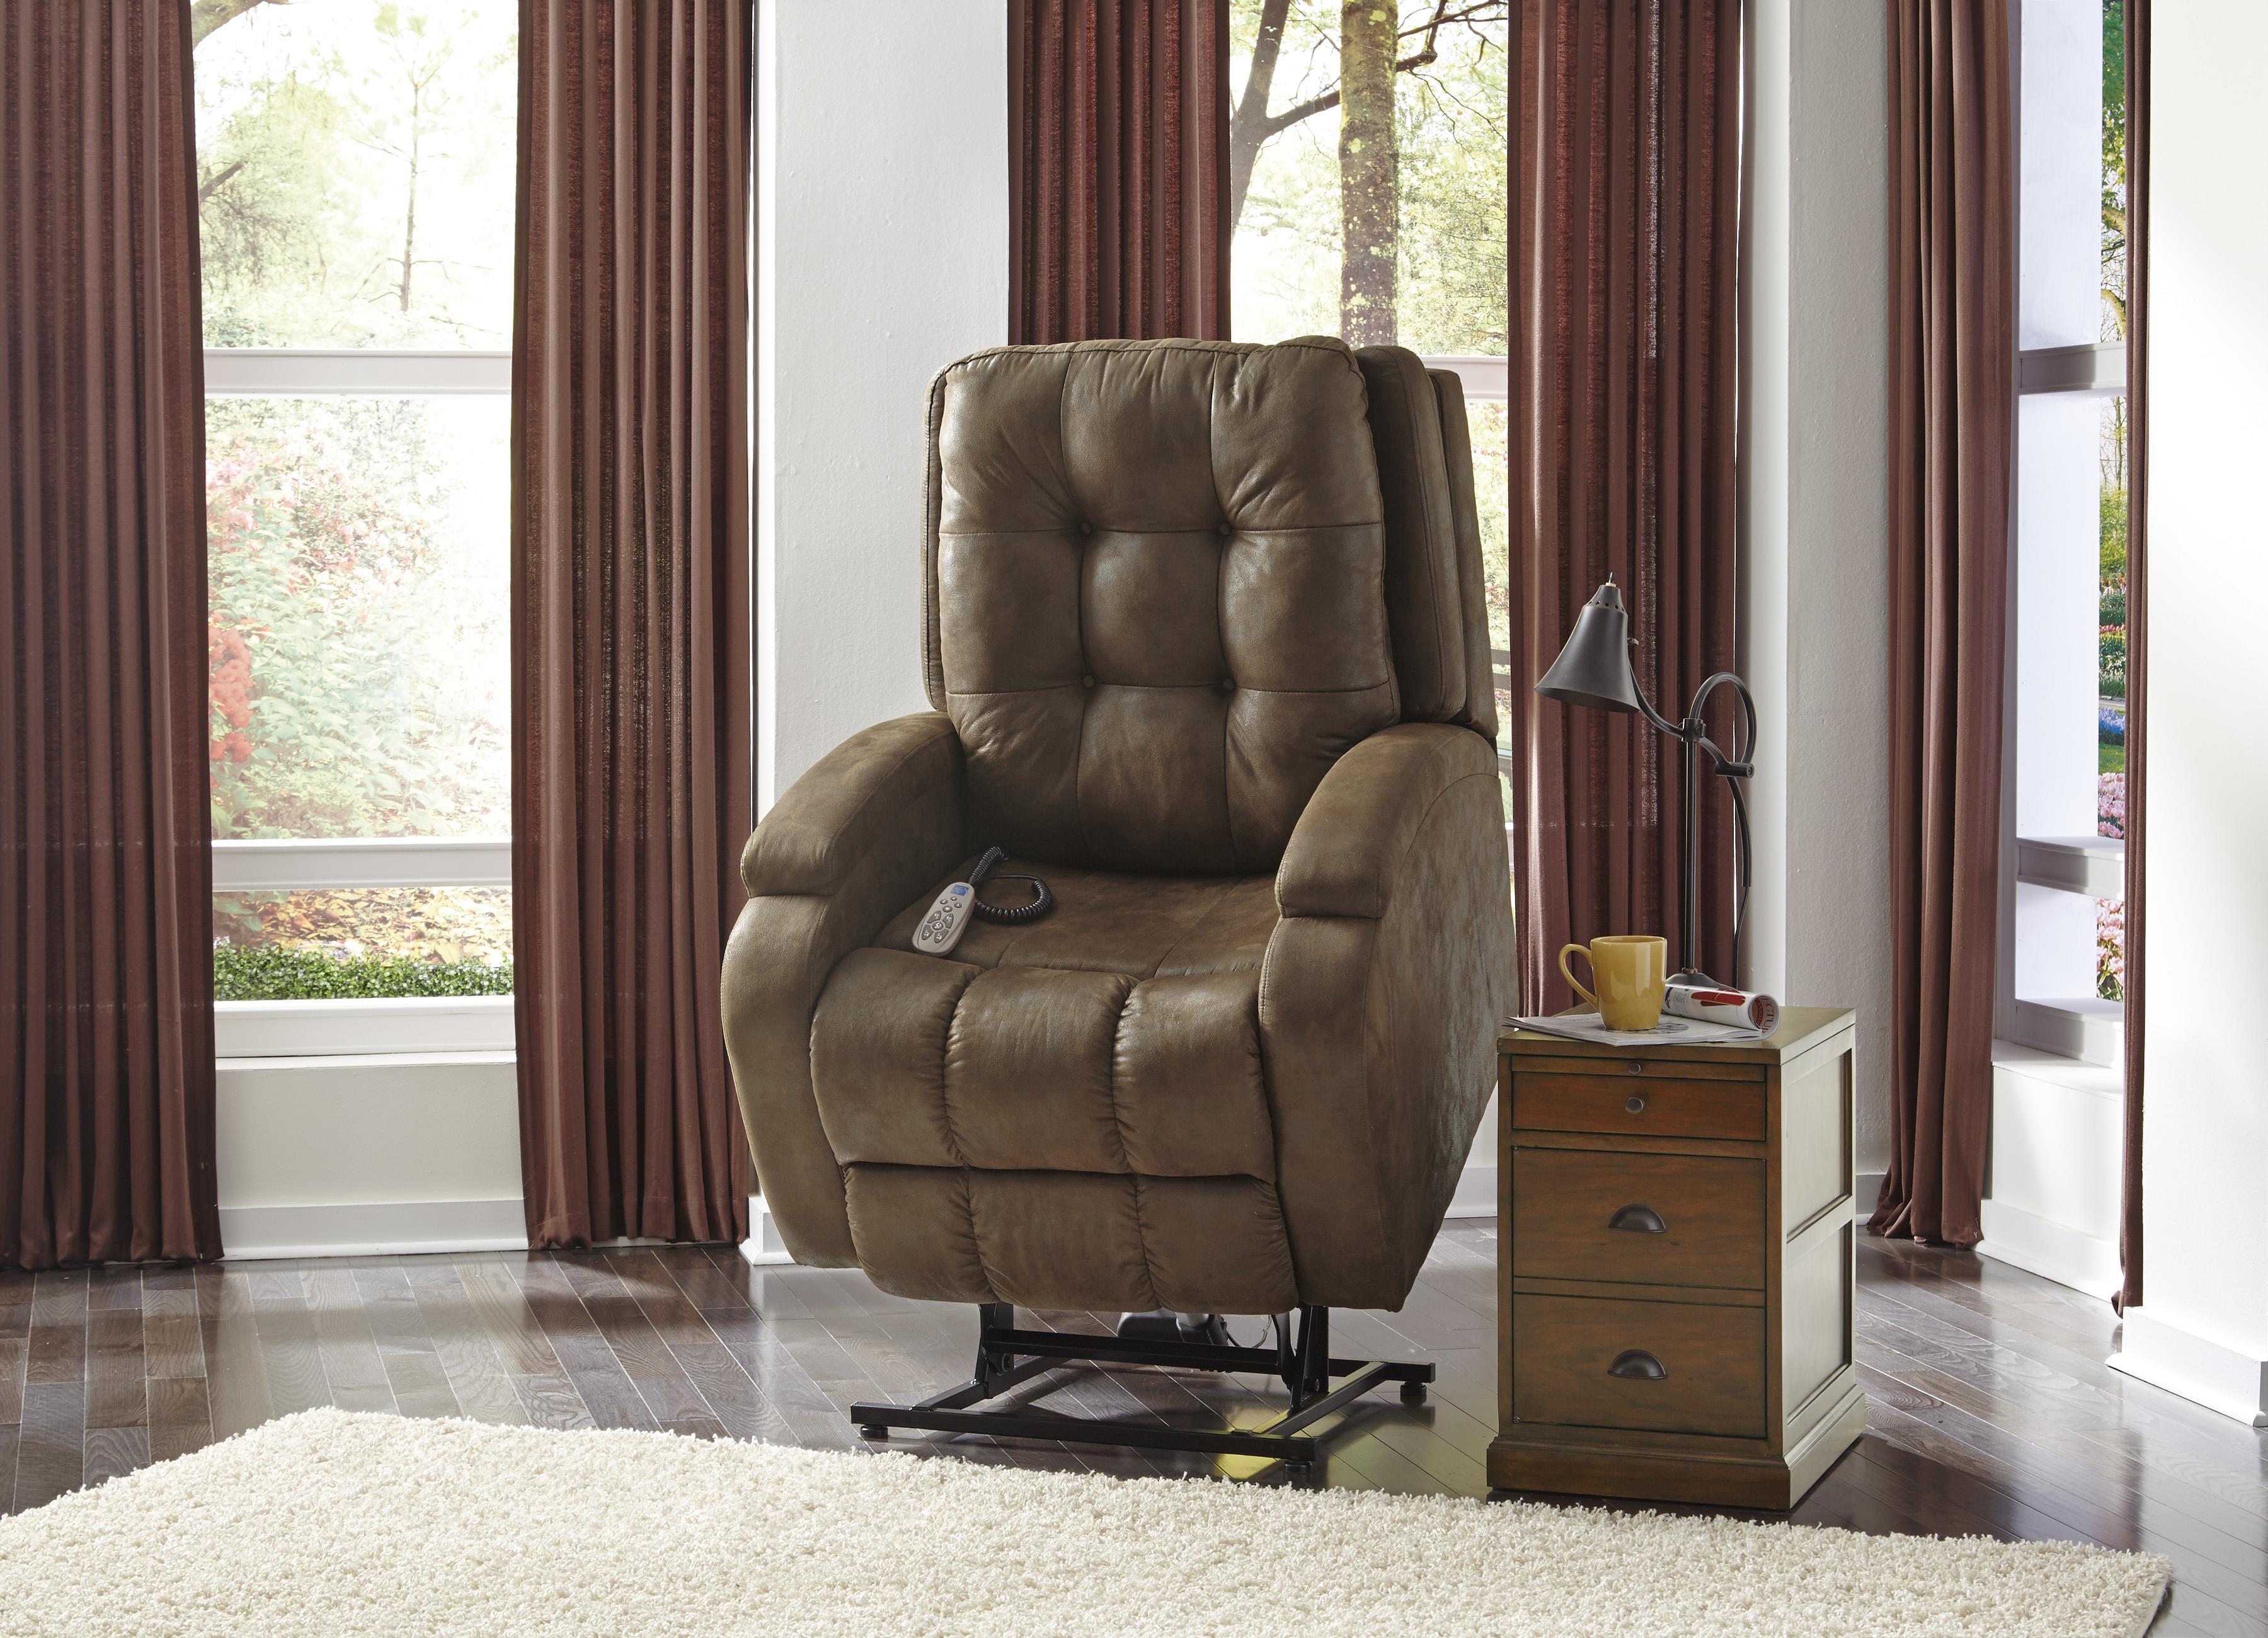 infinite position recliner power lift chair riser chairs flexsteel latitudes orion